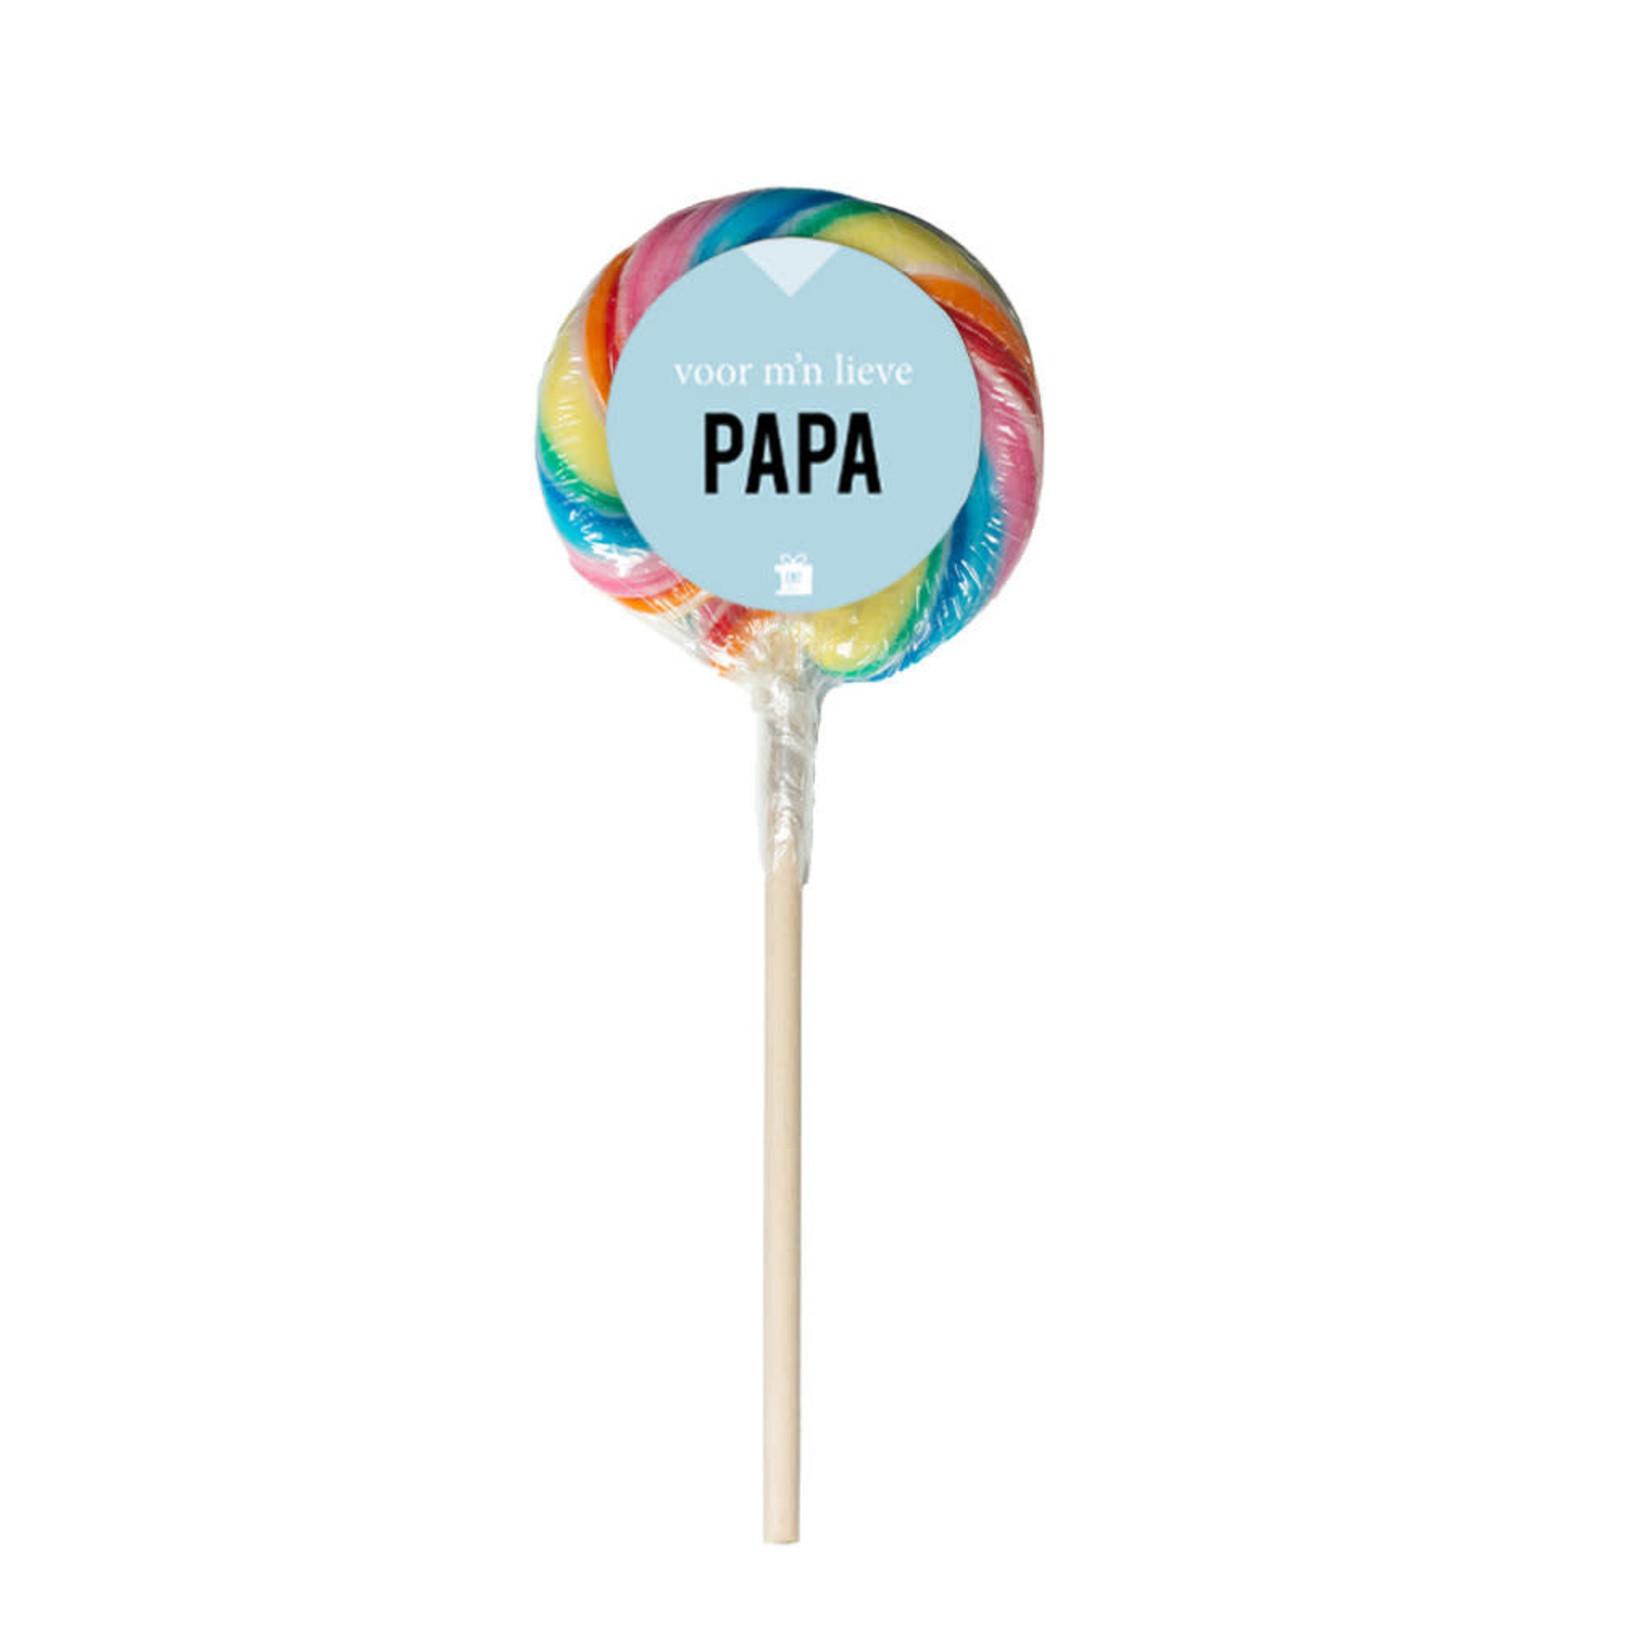 Eat your present Eat your present | Regenboog lolly lieve papa